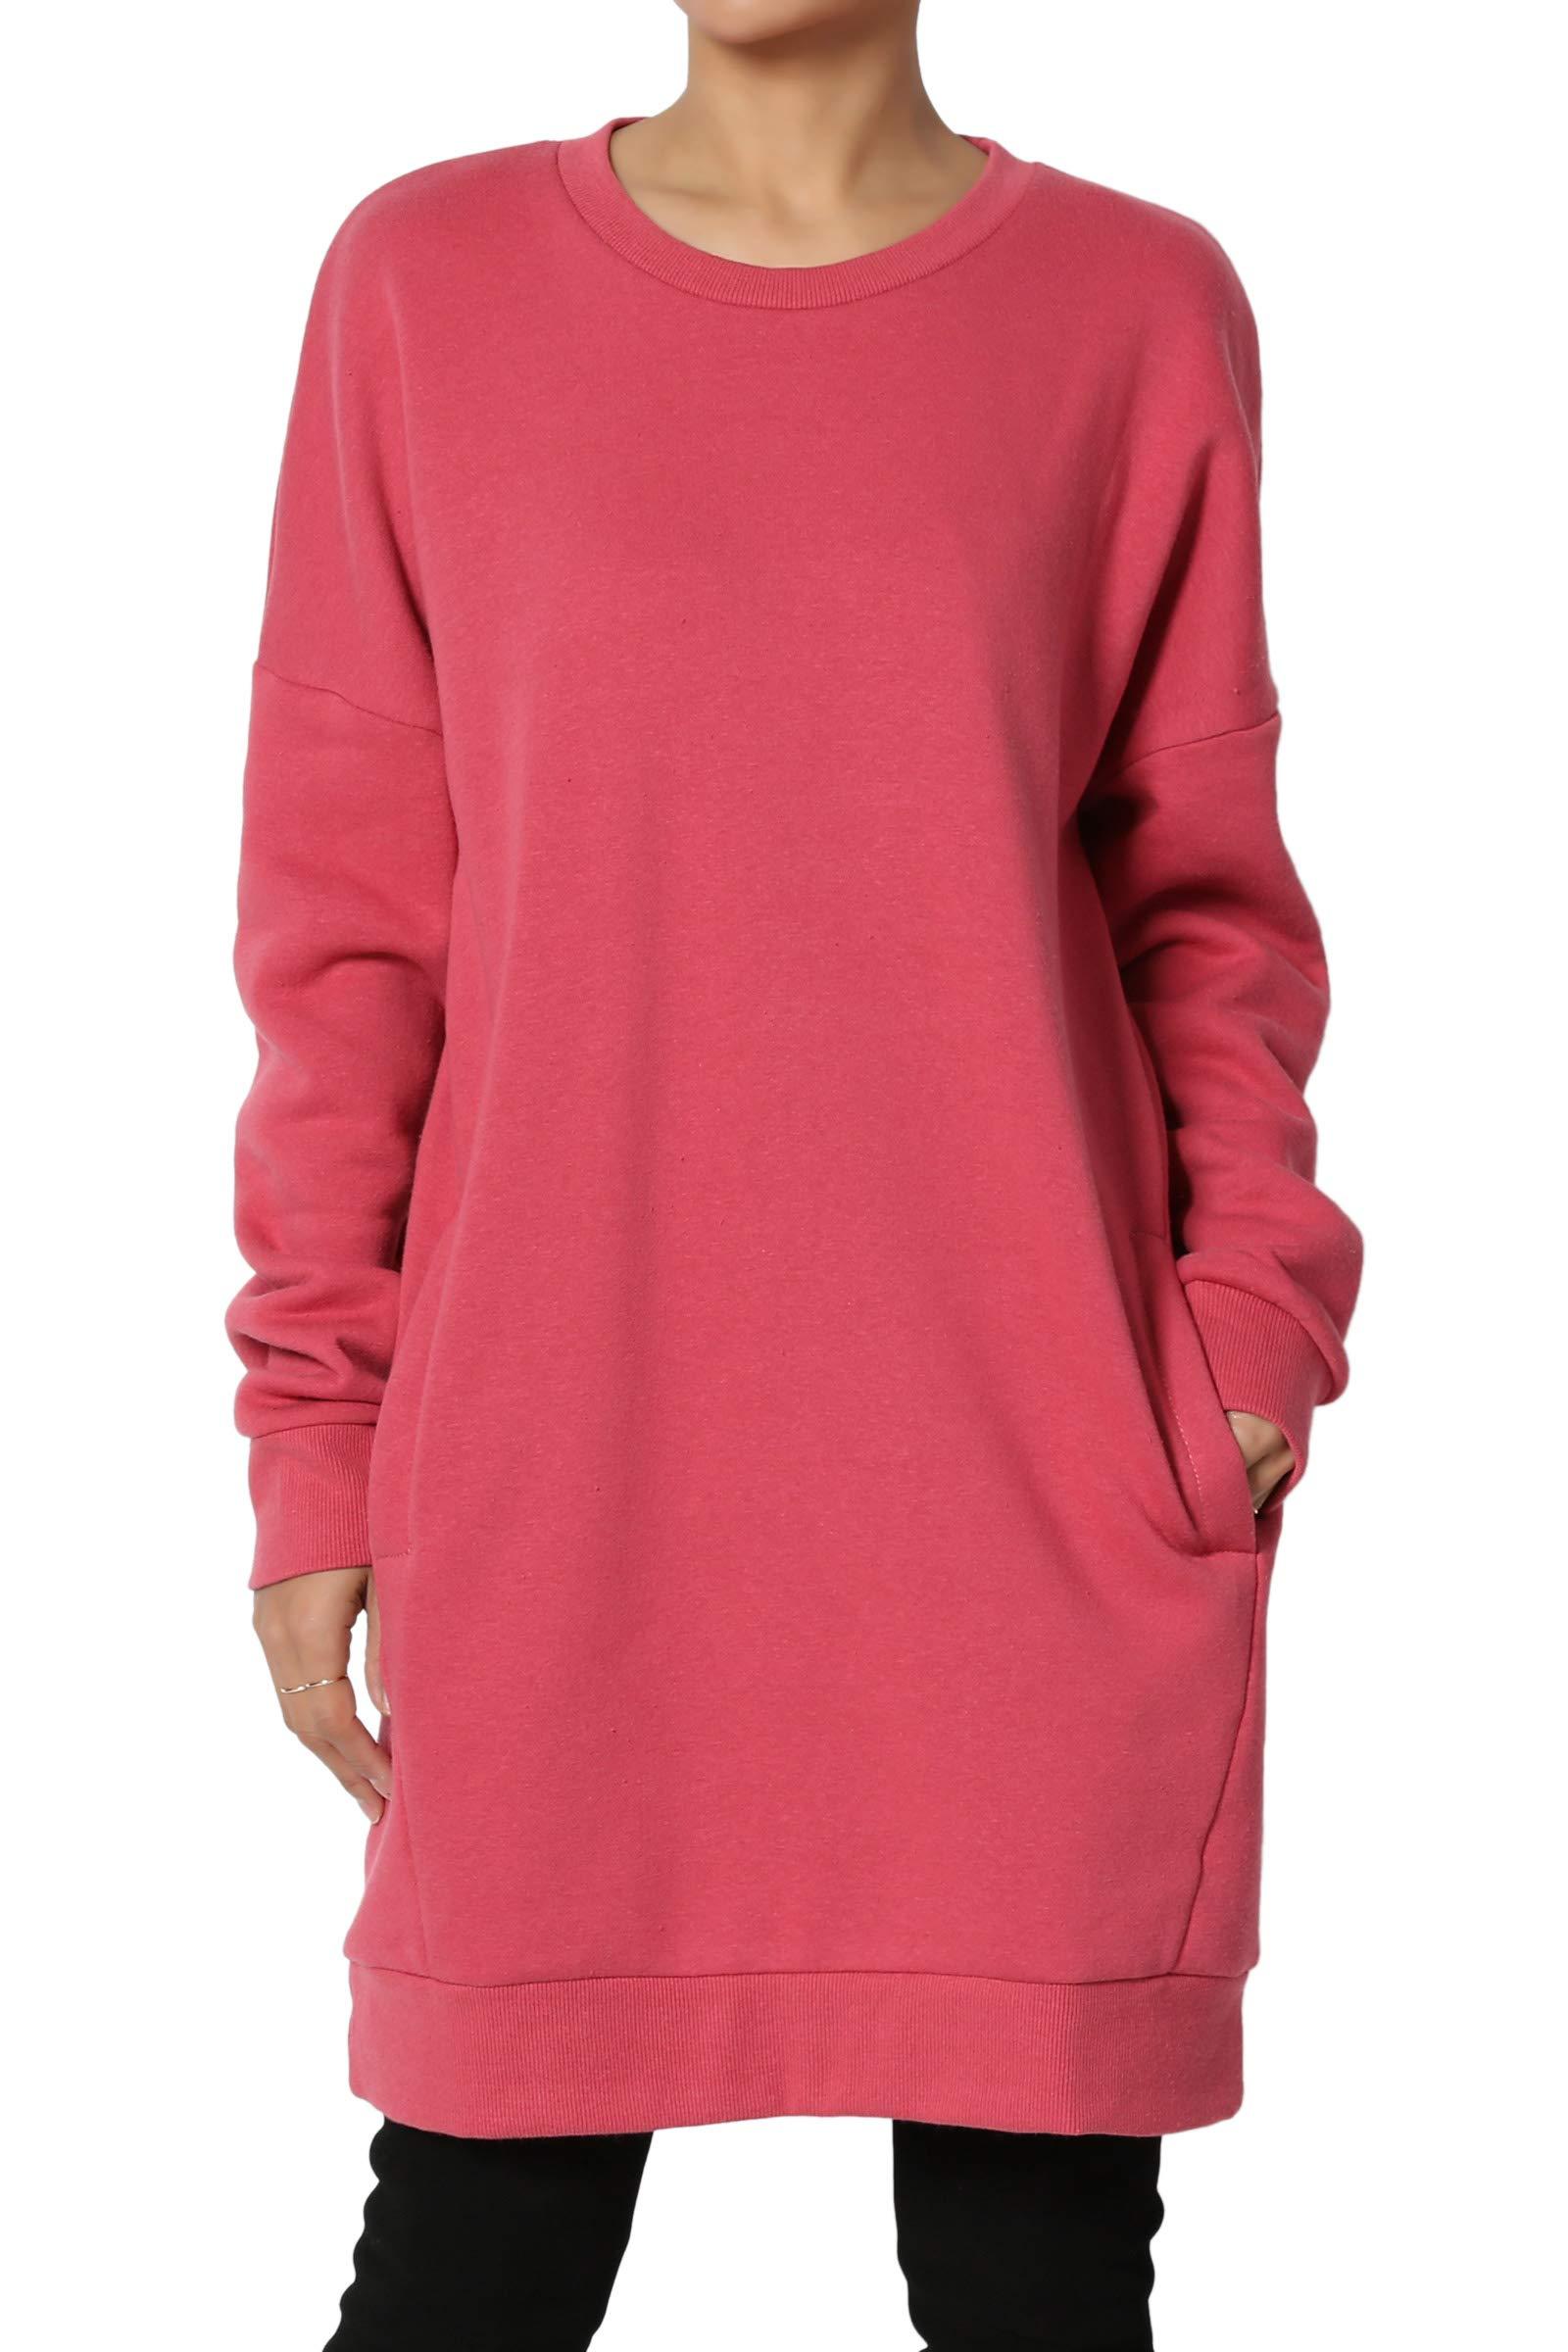 TheMogan Women's Casual Crew Neck Pocket Loose Sweatshirt Tunic Rose 1XL